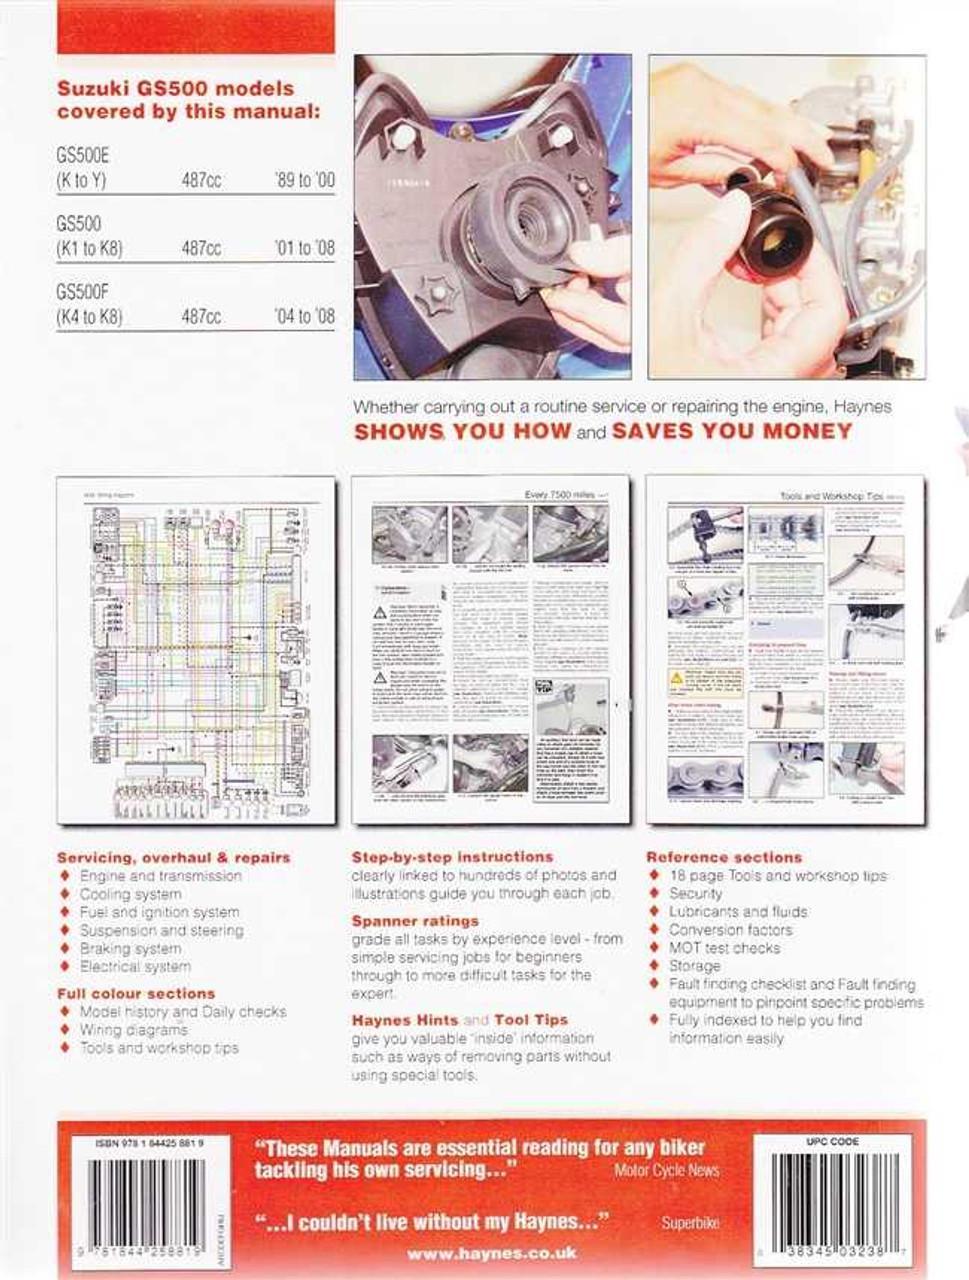 Suzuki gs500f wiring diagram   manual e-books.